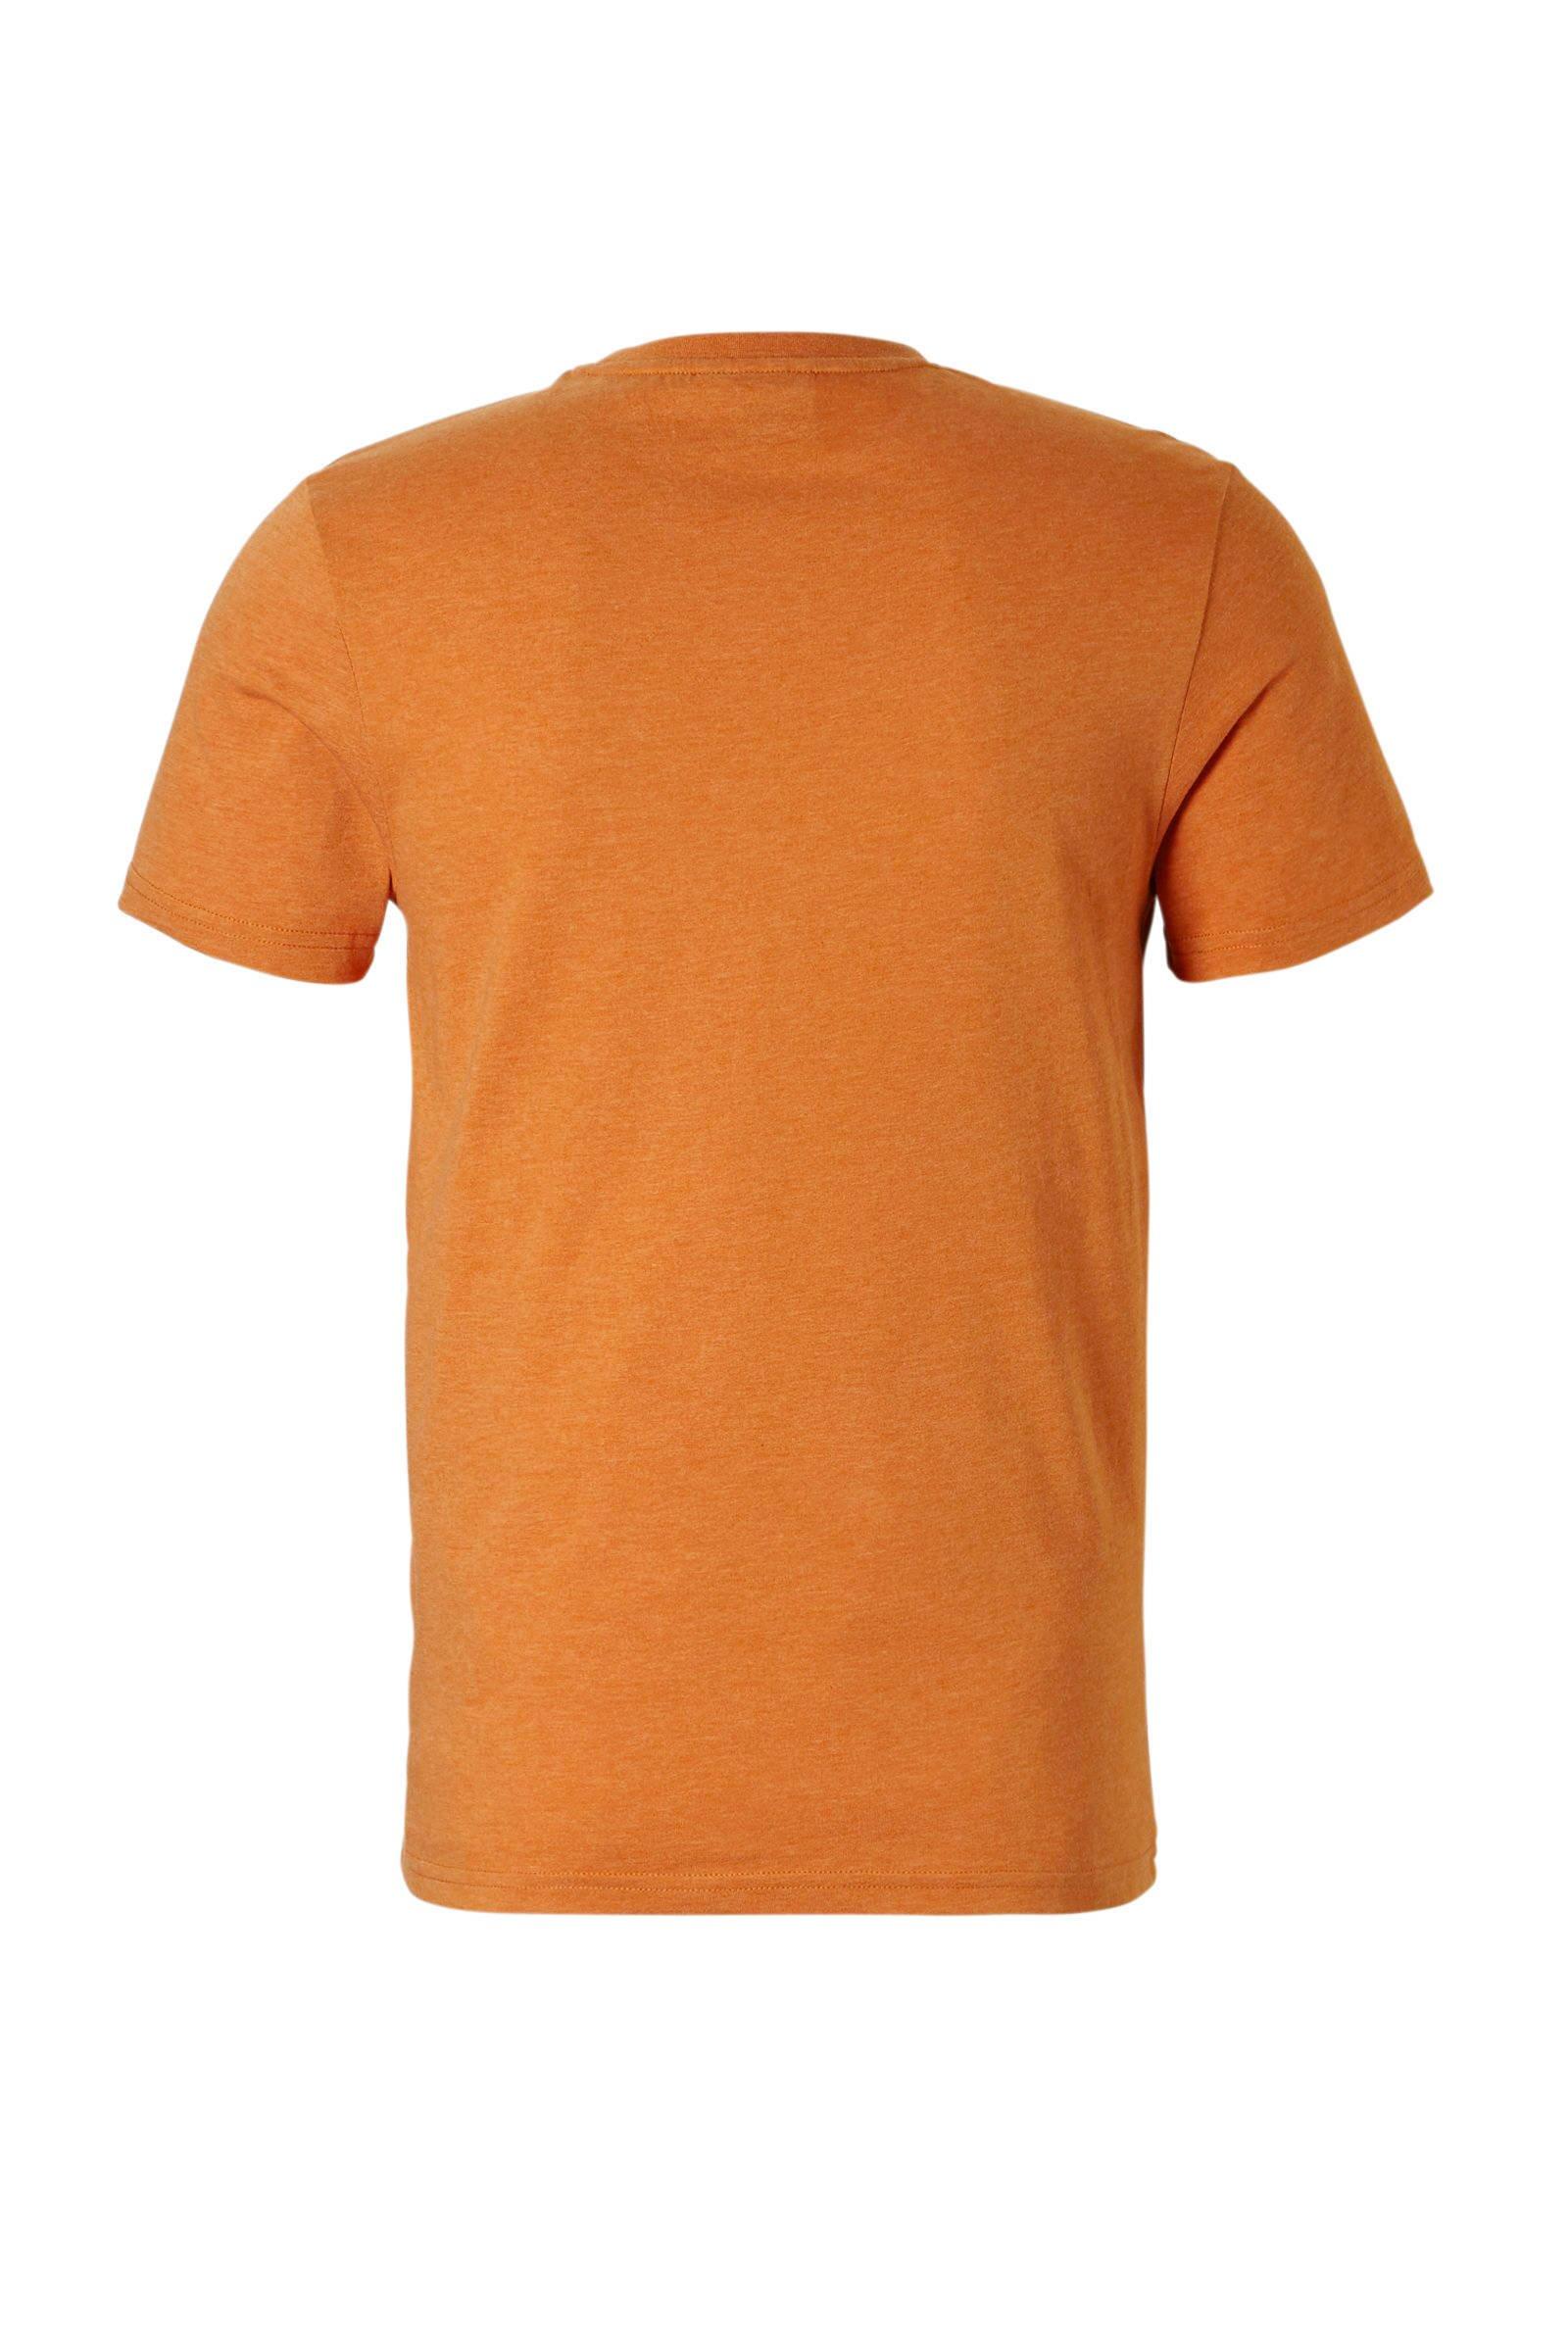 Scott shirt sport oranje T Lyle ZnU6qXwxx